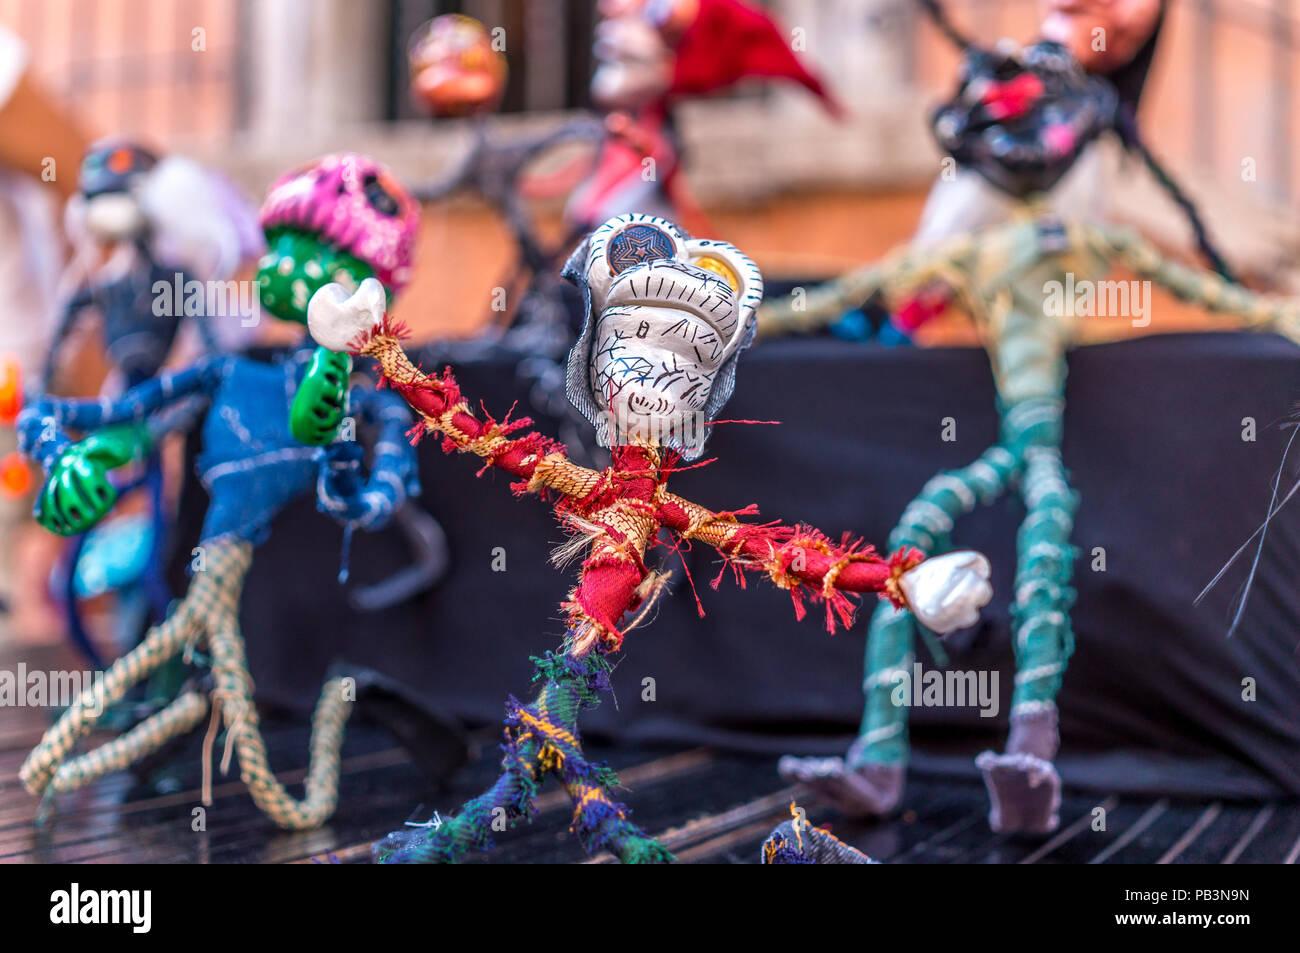 Bunte stick Figuren, die Dia de los Muertos Zeichen Stockbild